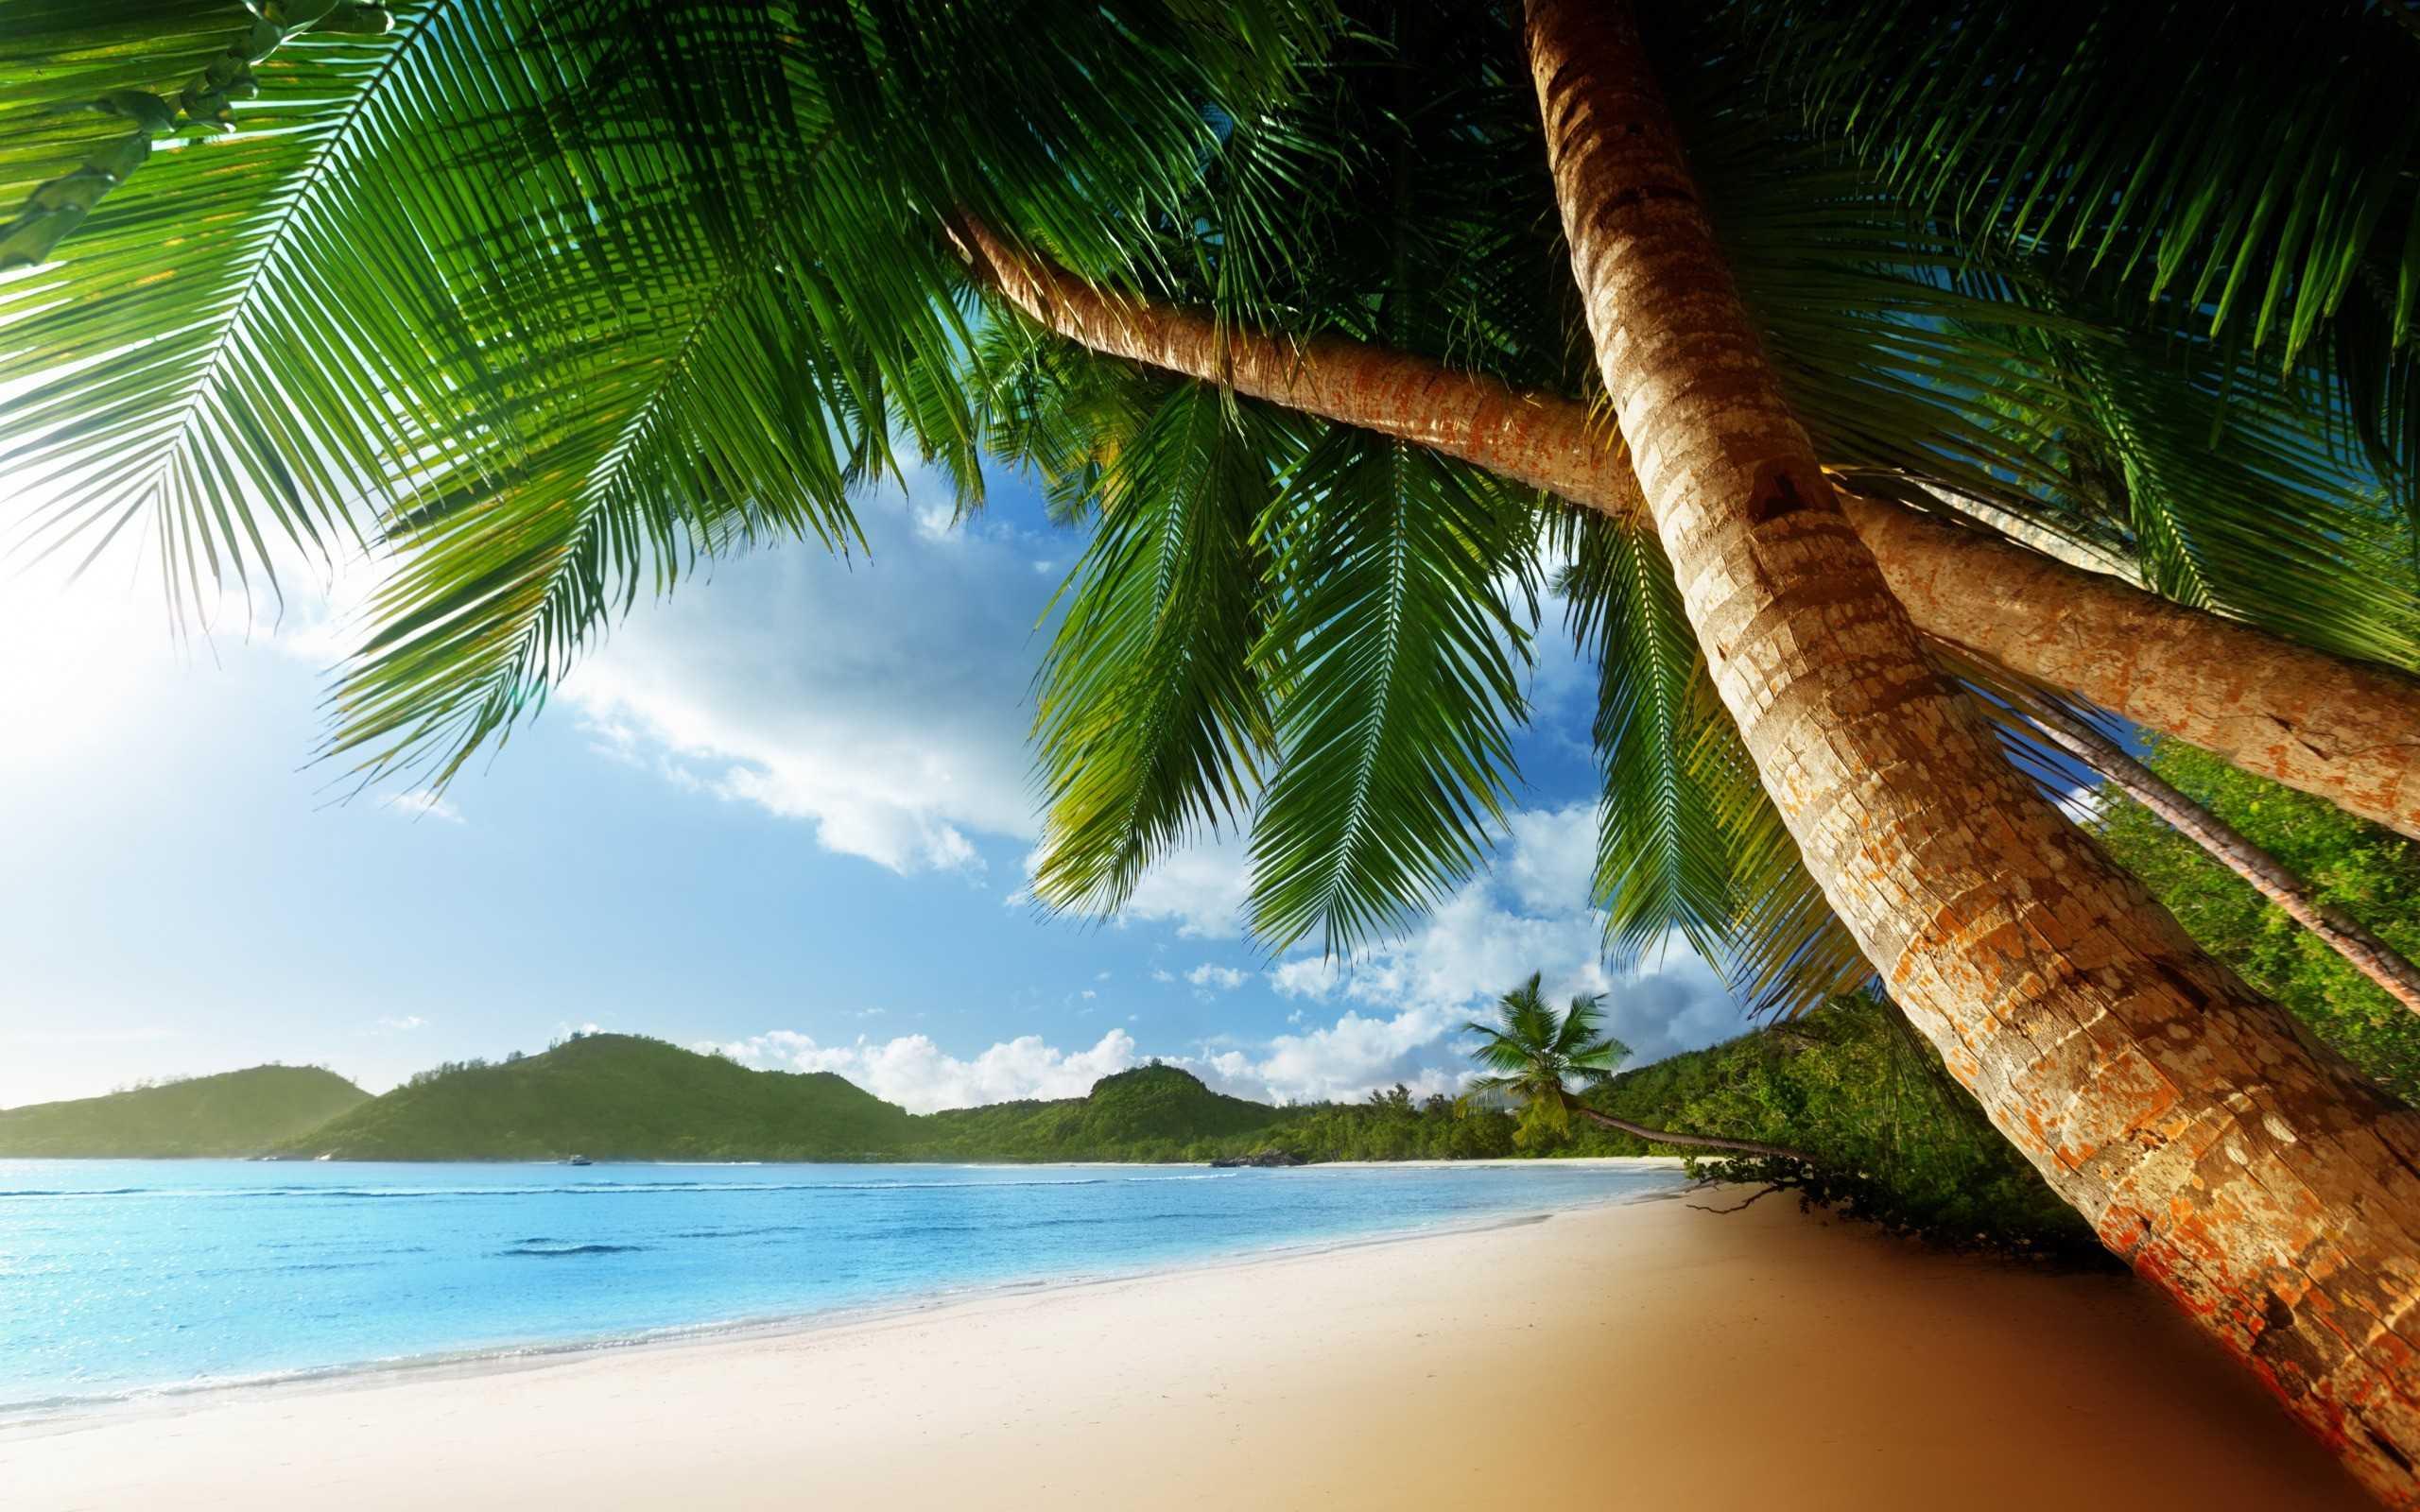 Heavenly palm trees-fnbworld